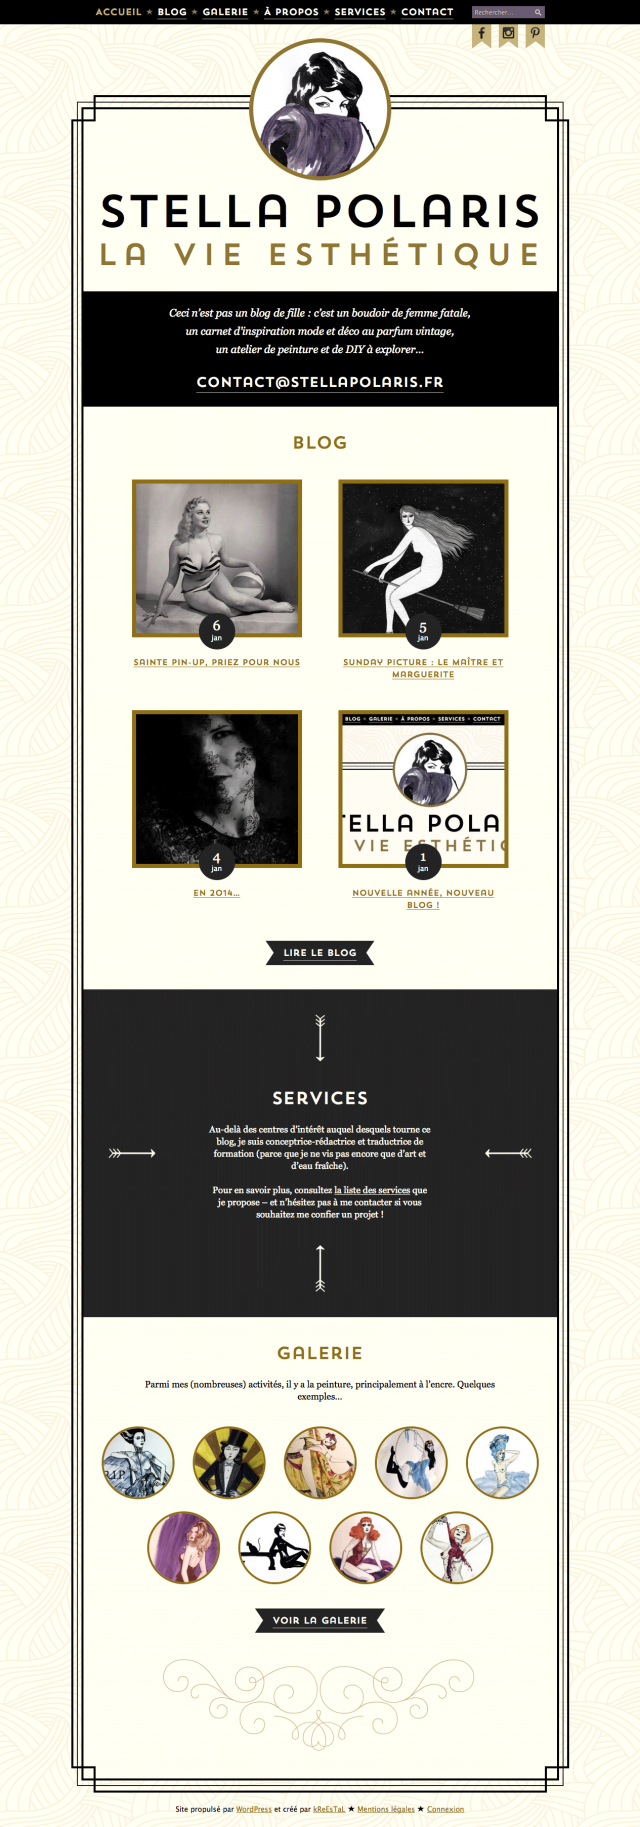 Stella Polaris : page d'accueil desktop